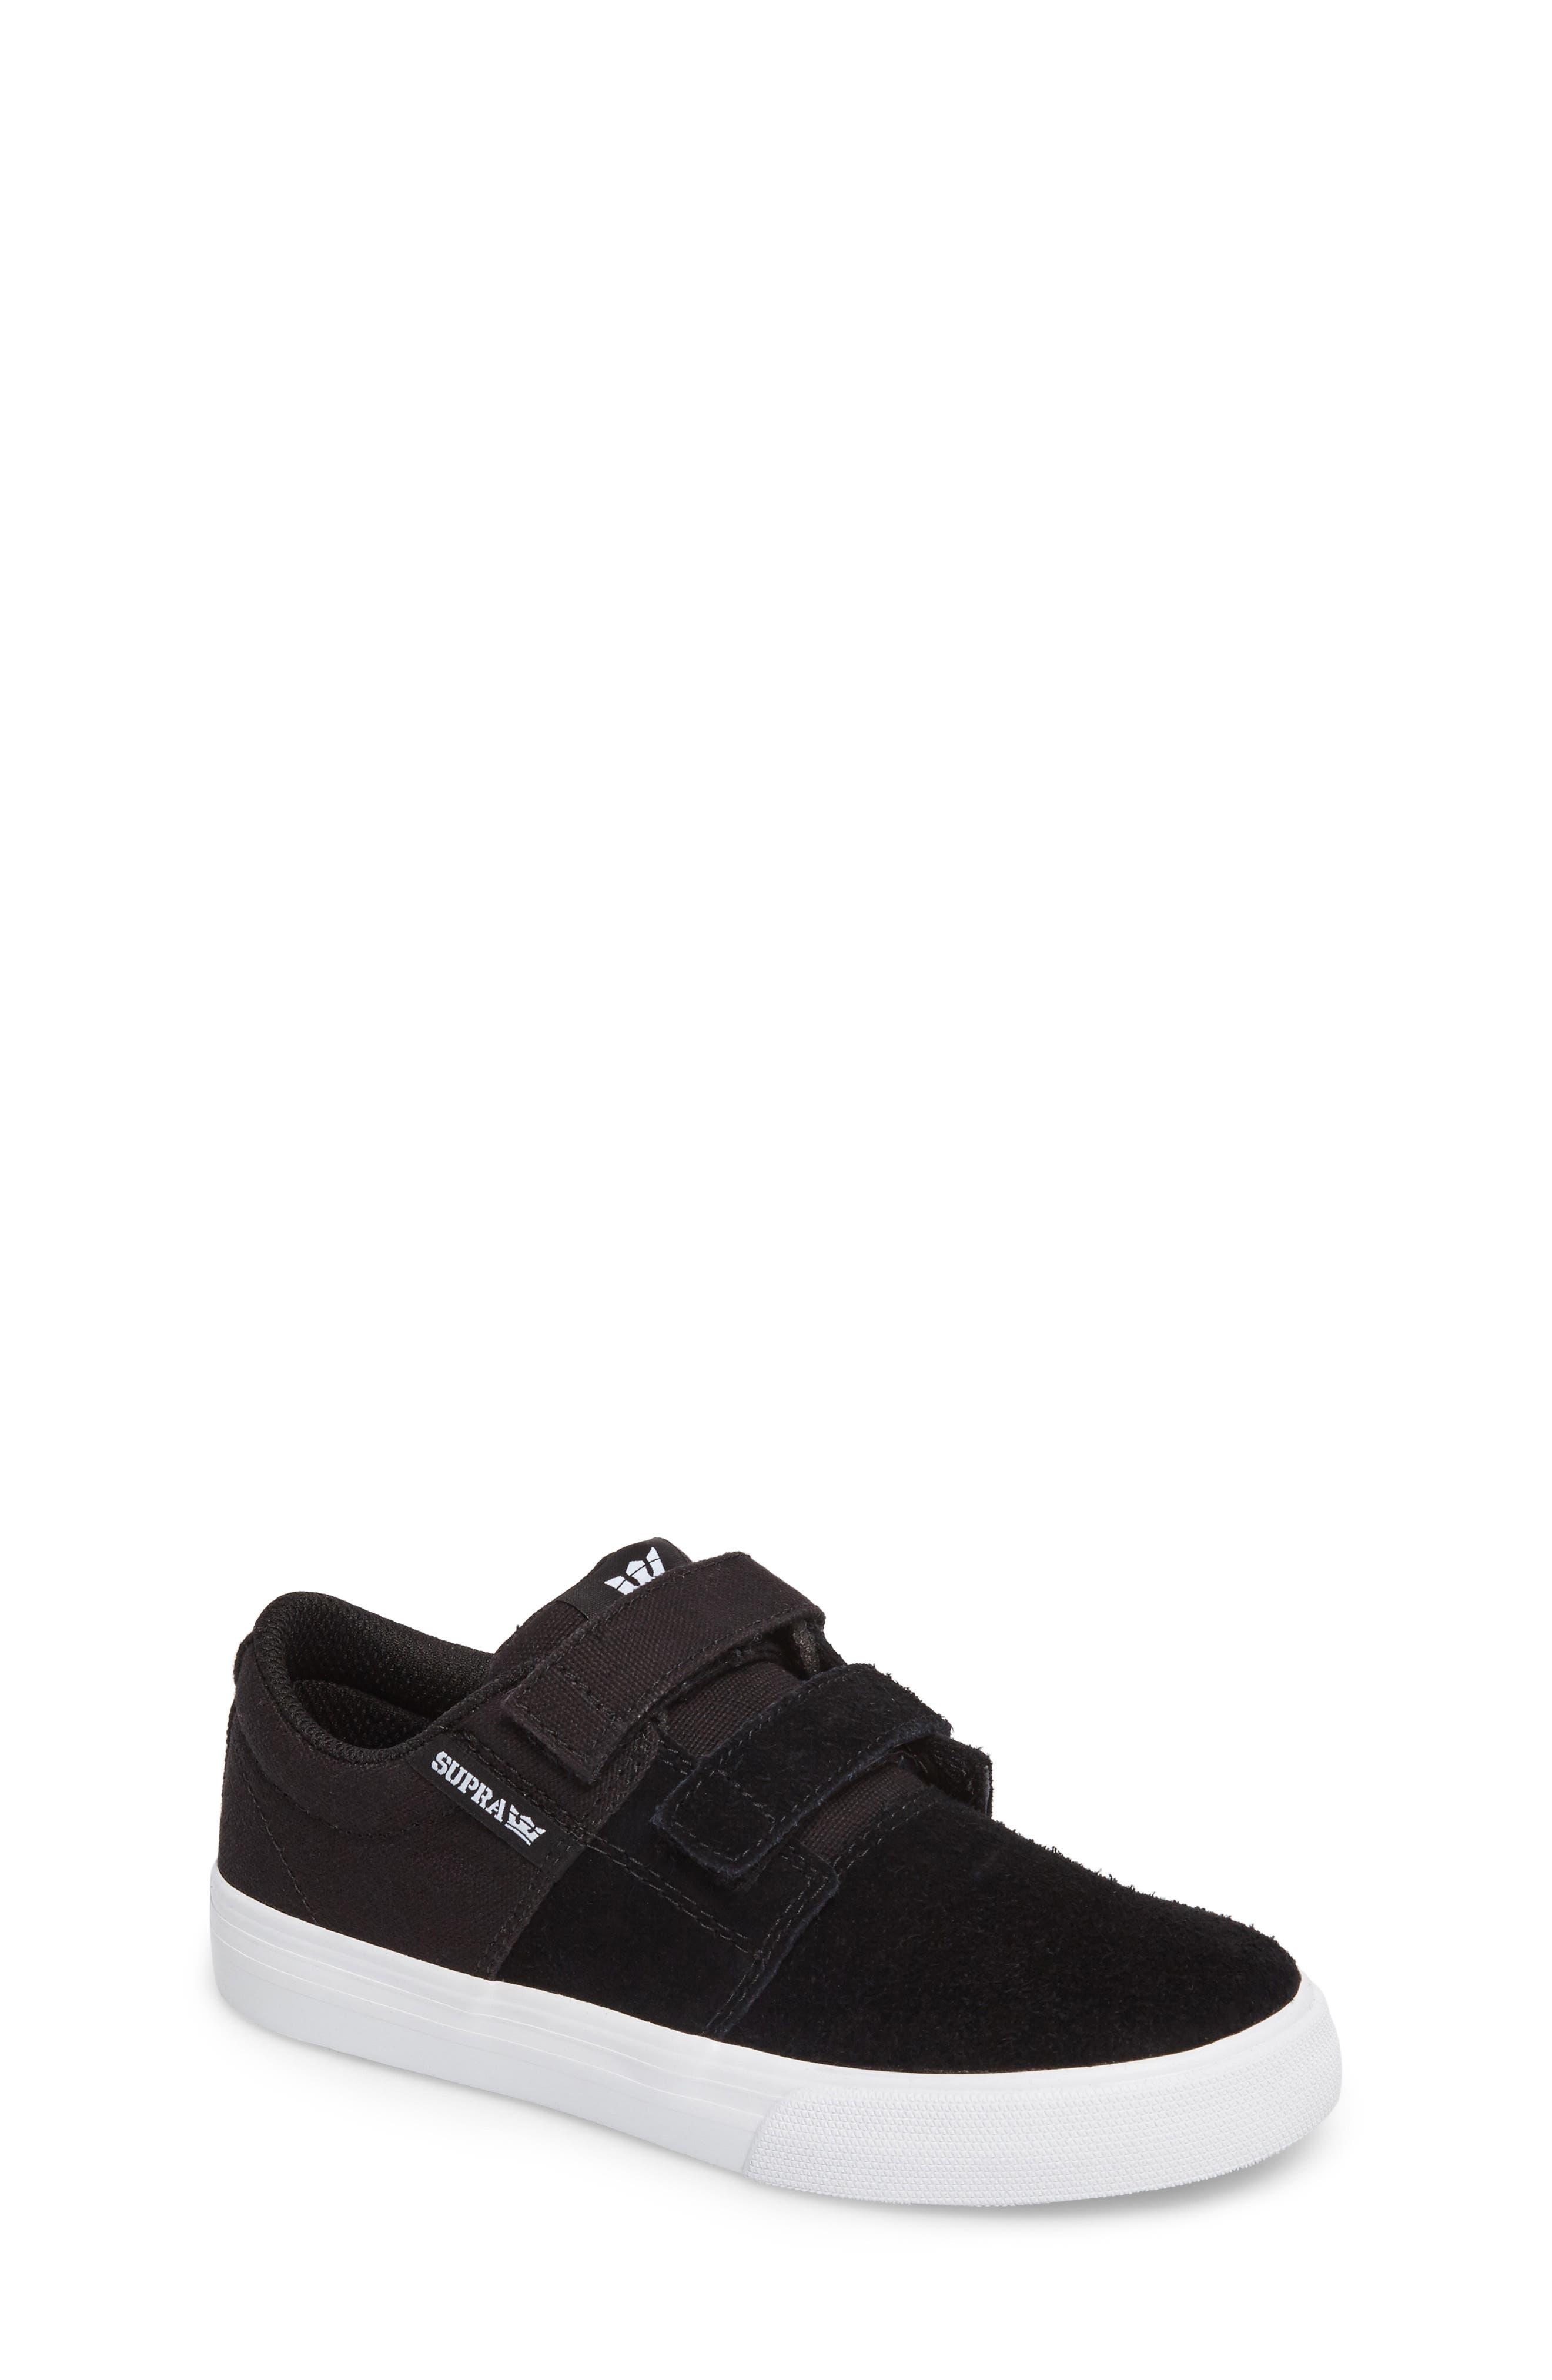 Stacks Low Top Sneaker,                             Main thumbnail 1, color,                             BLACK - WHITE